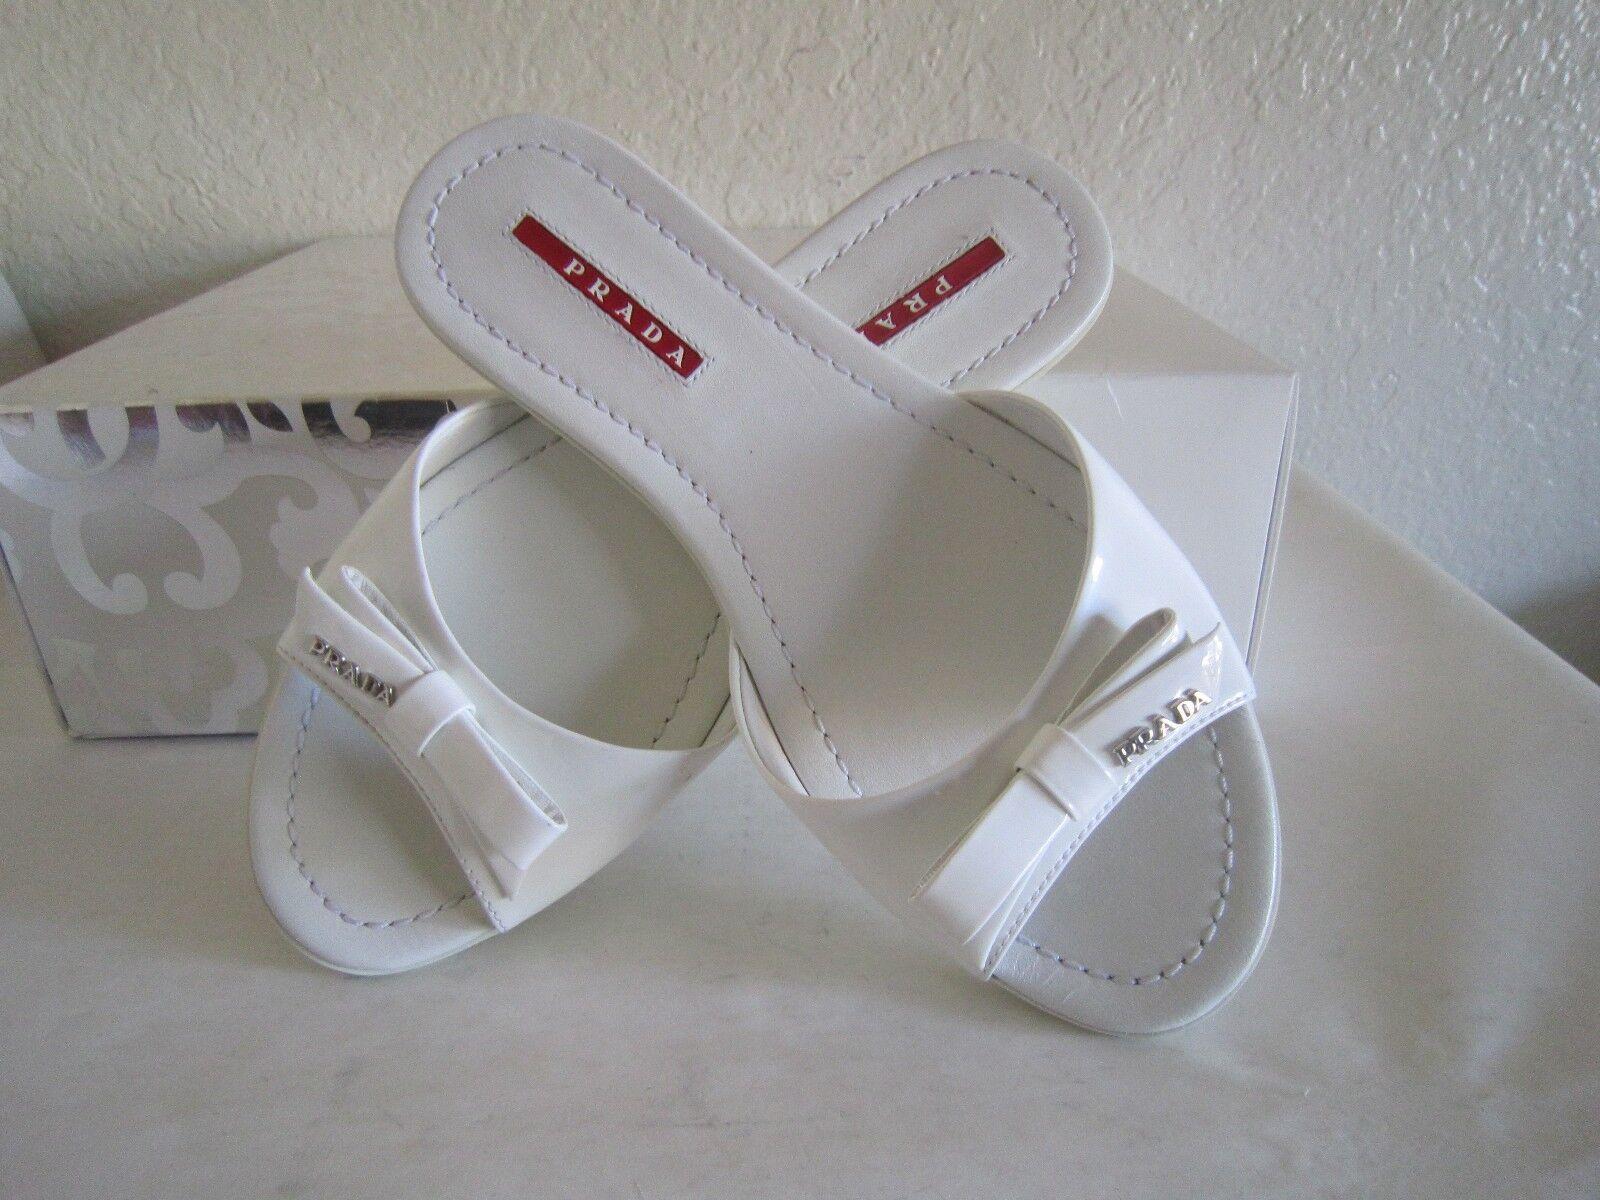 PRADA Weiß Patent  Bow Leder Flat Bow  Slide Sandals Mules schuhes  Sz 36 Us 6 $390 ae847b